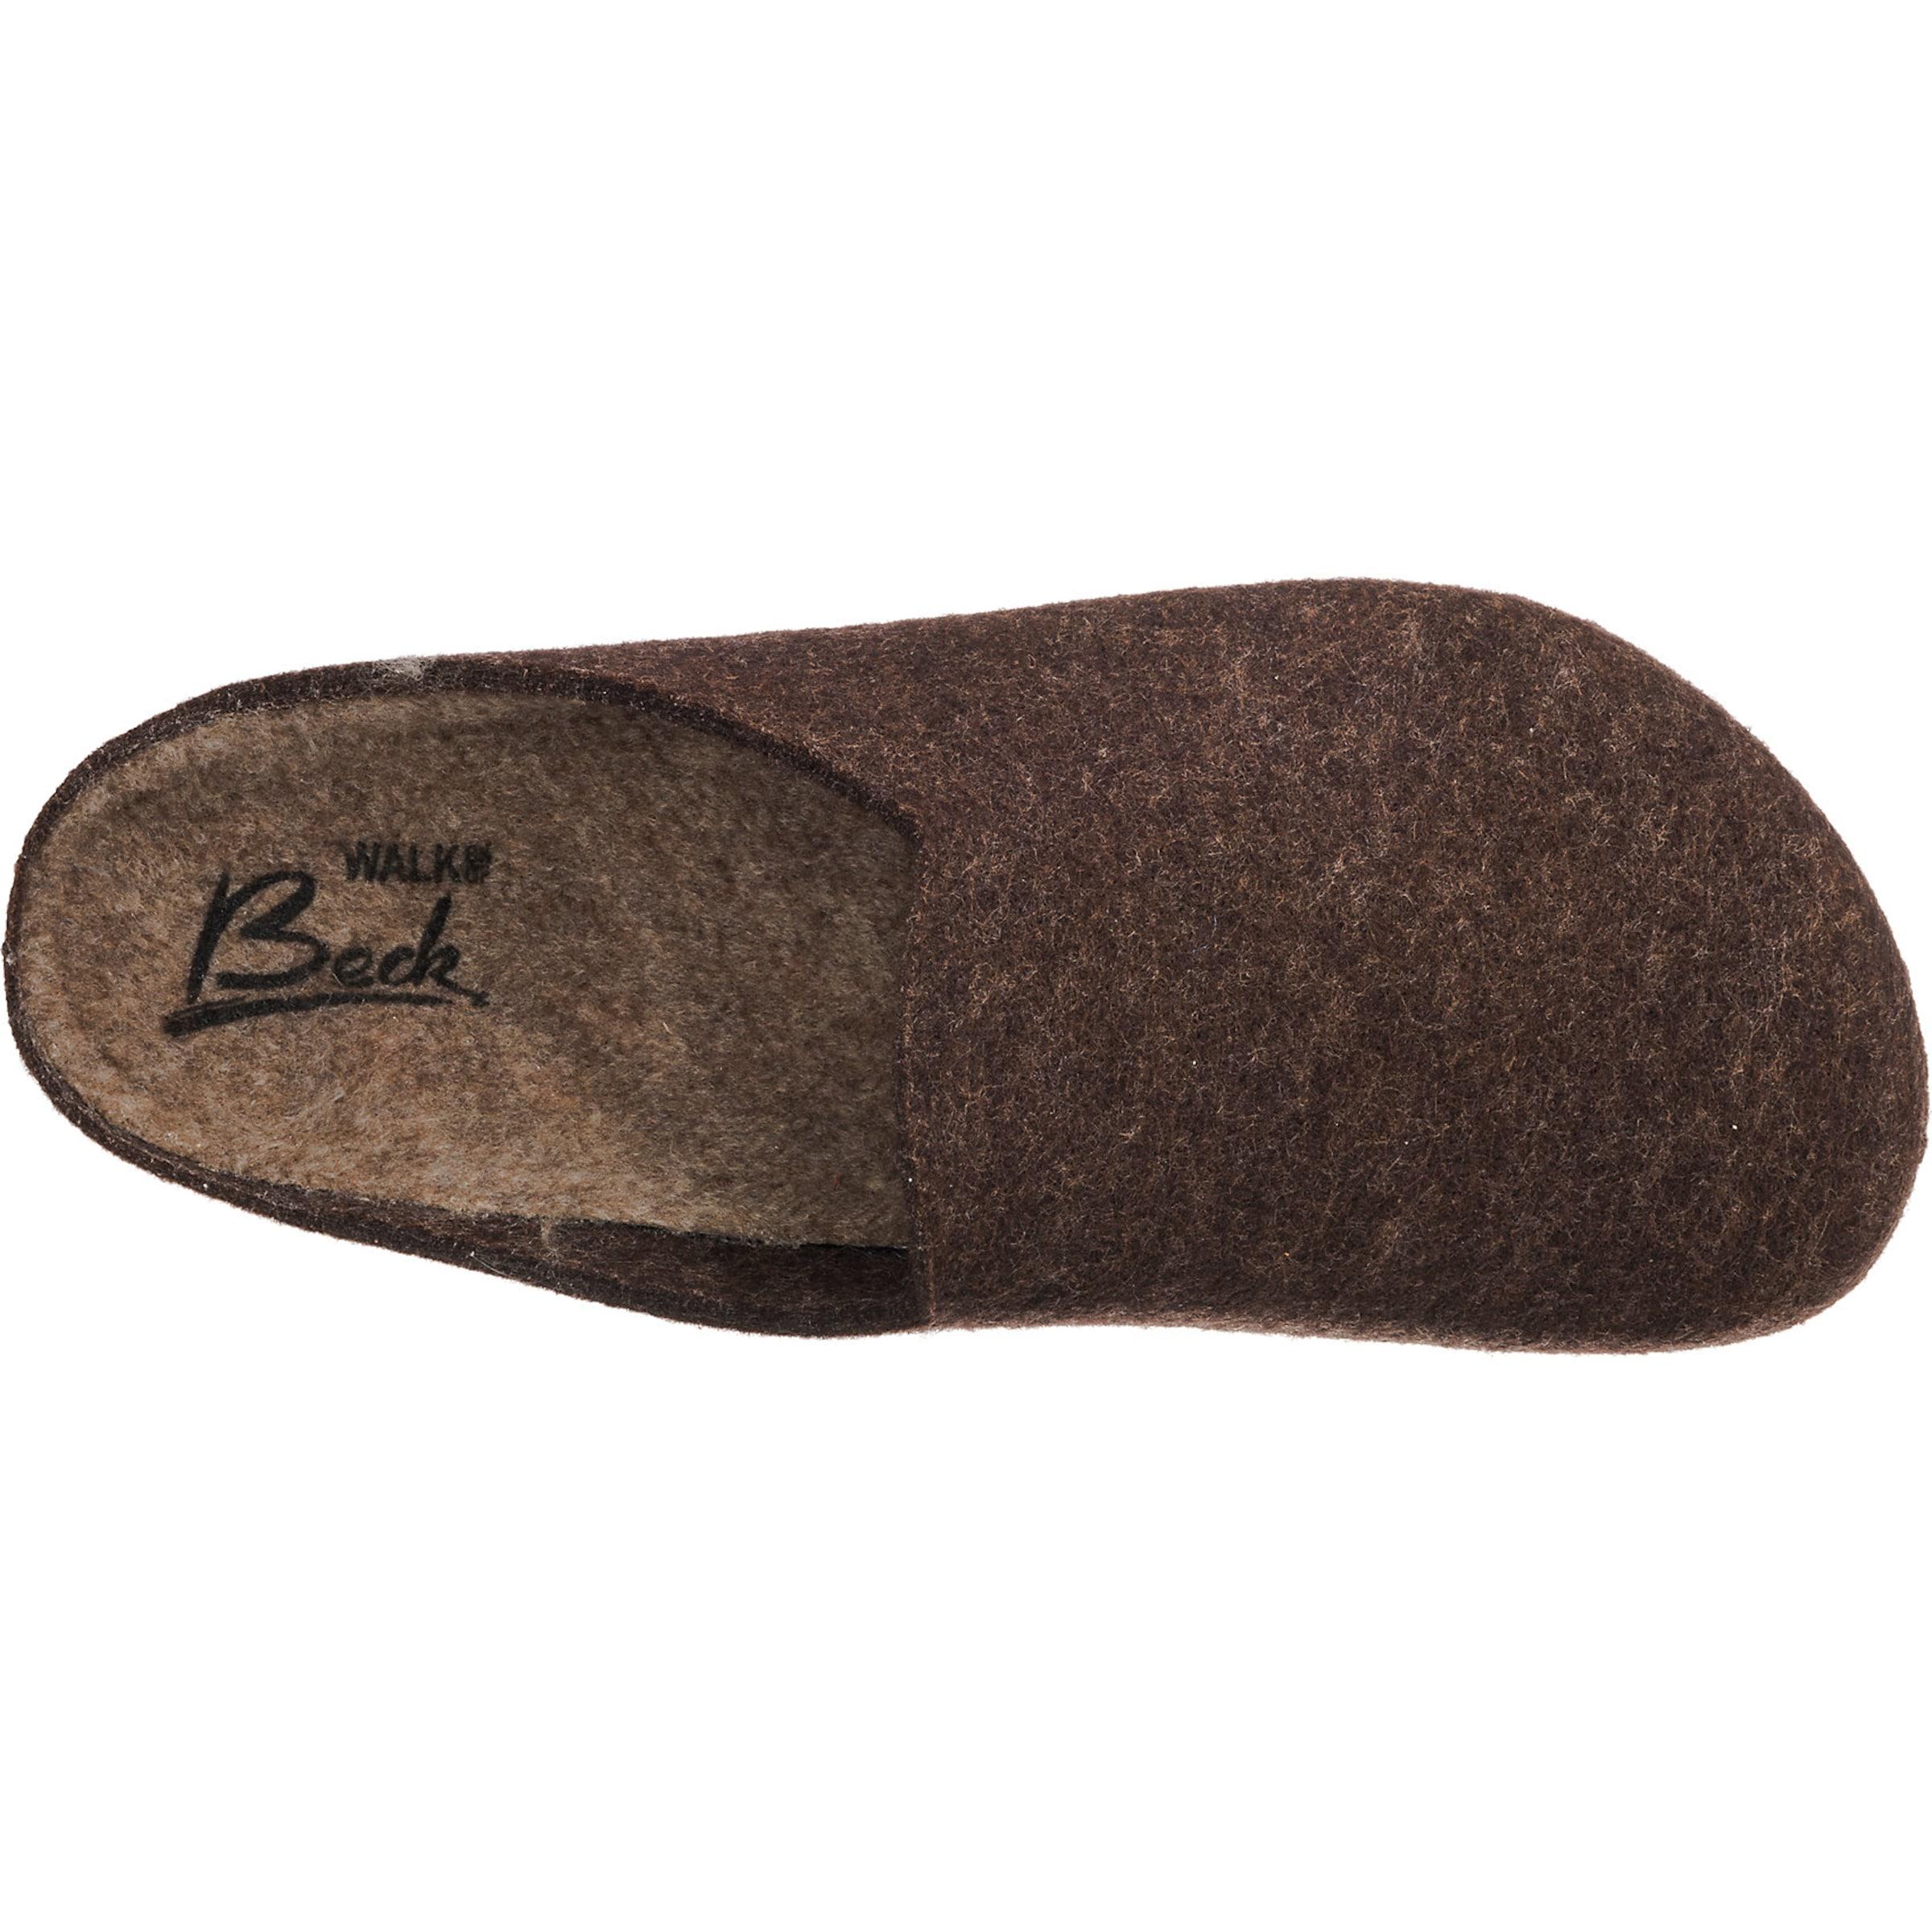 Braun In Pantoffeln Pantoffeln In Braun Beck Beck 'kasimir' 'kasimir' Beck FTJK1cl3